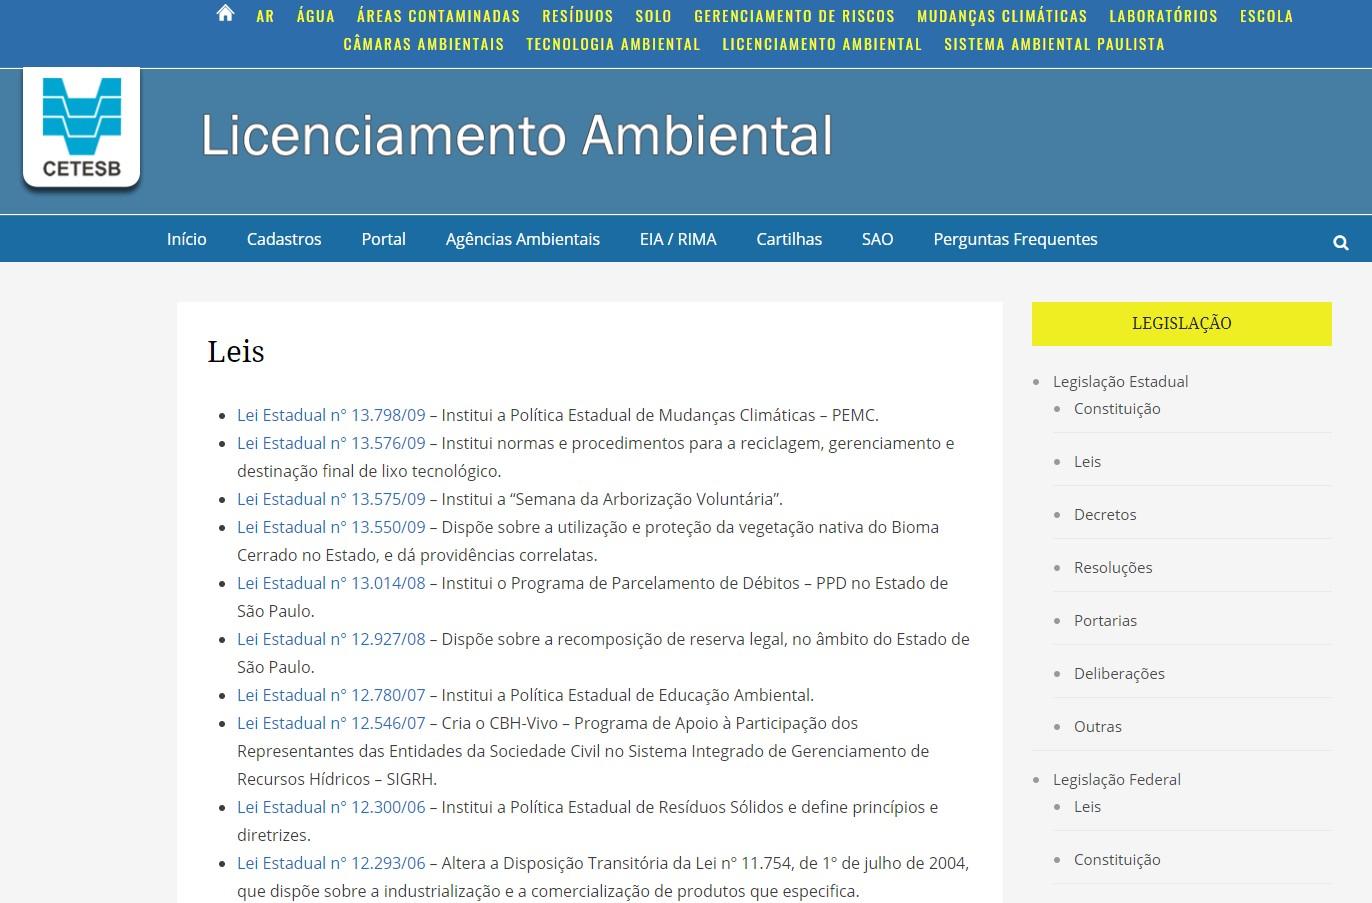 Legislação ambiental leis consulta